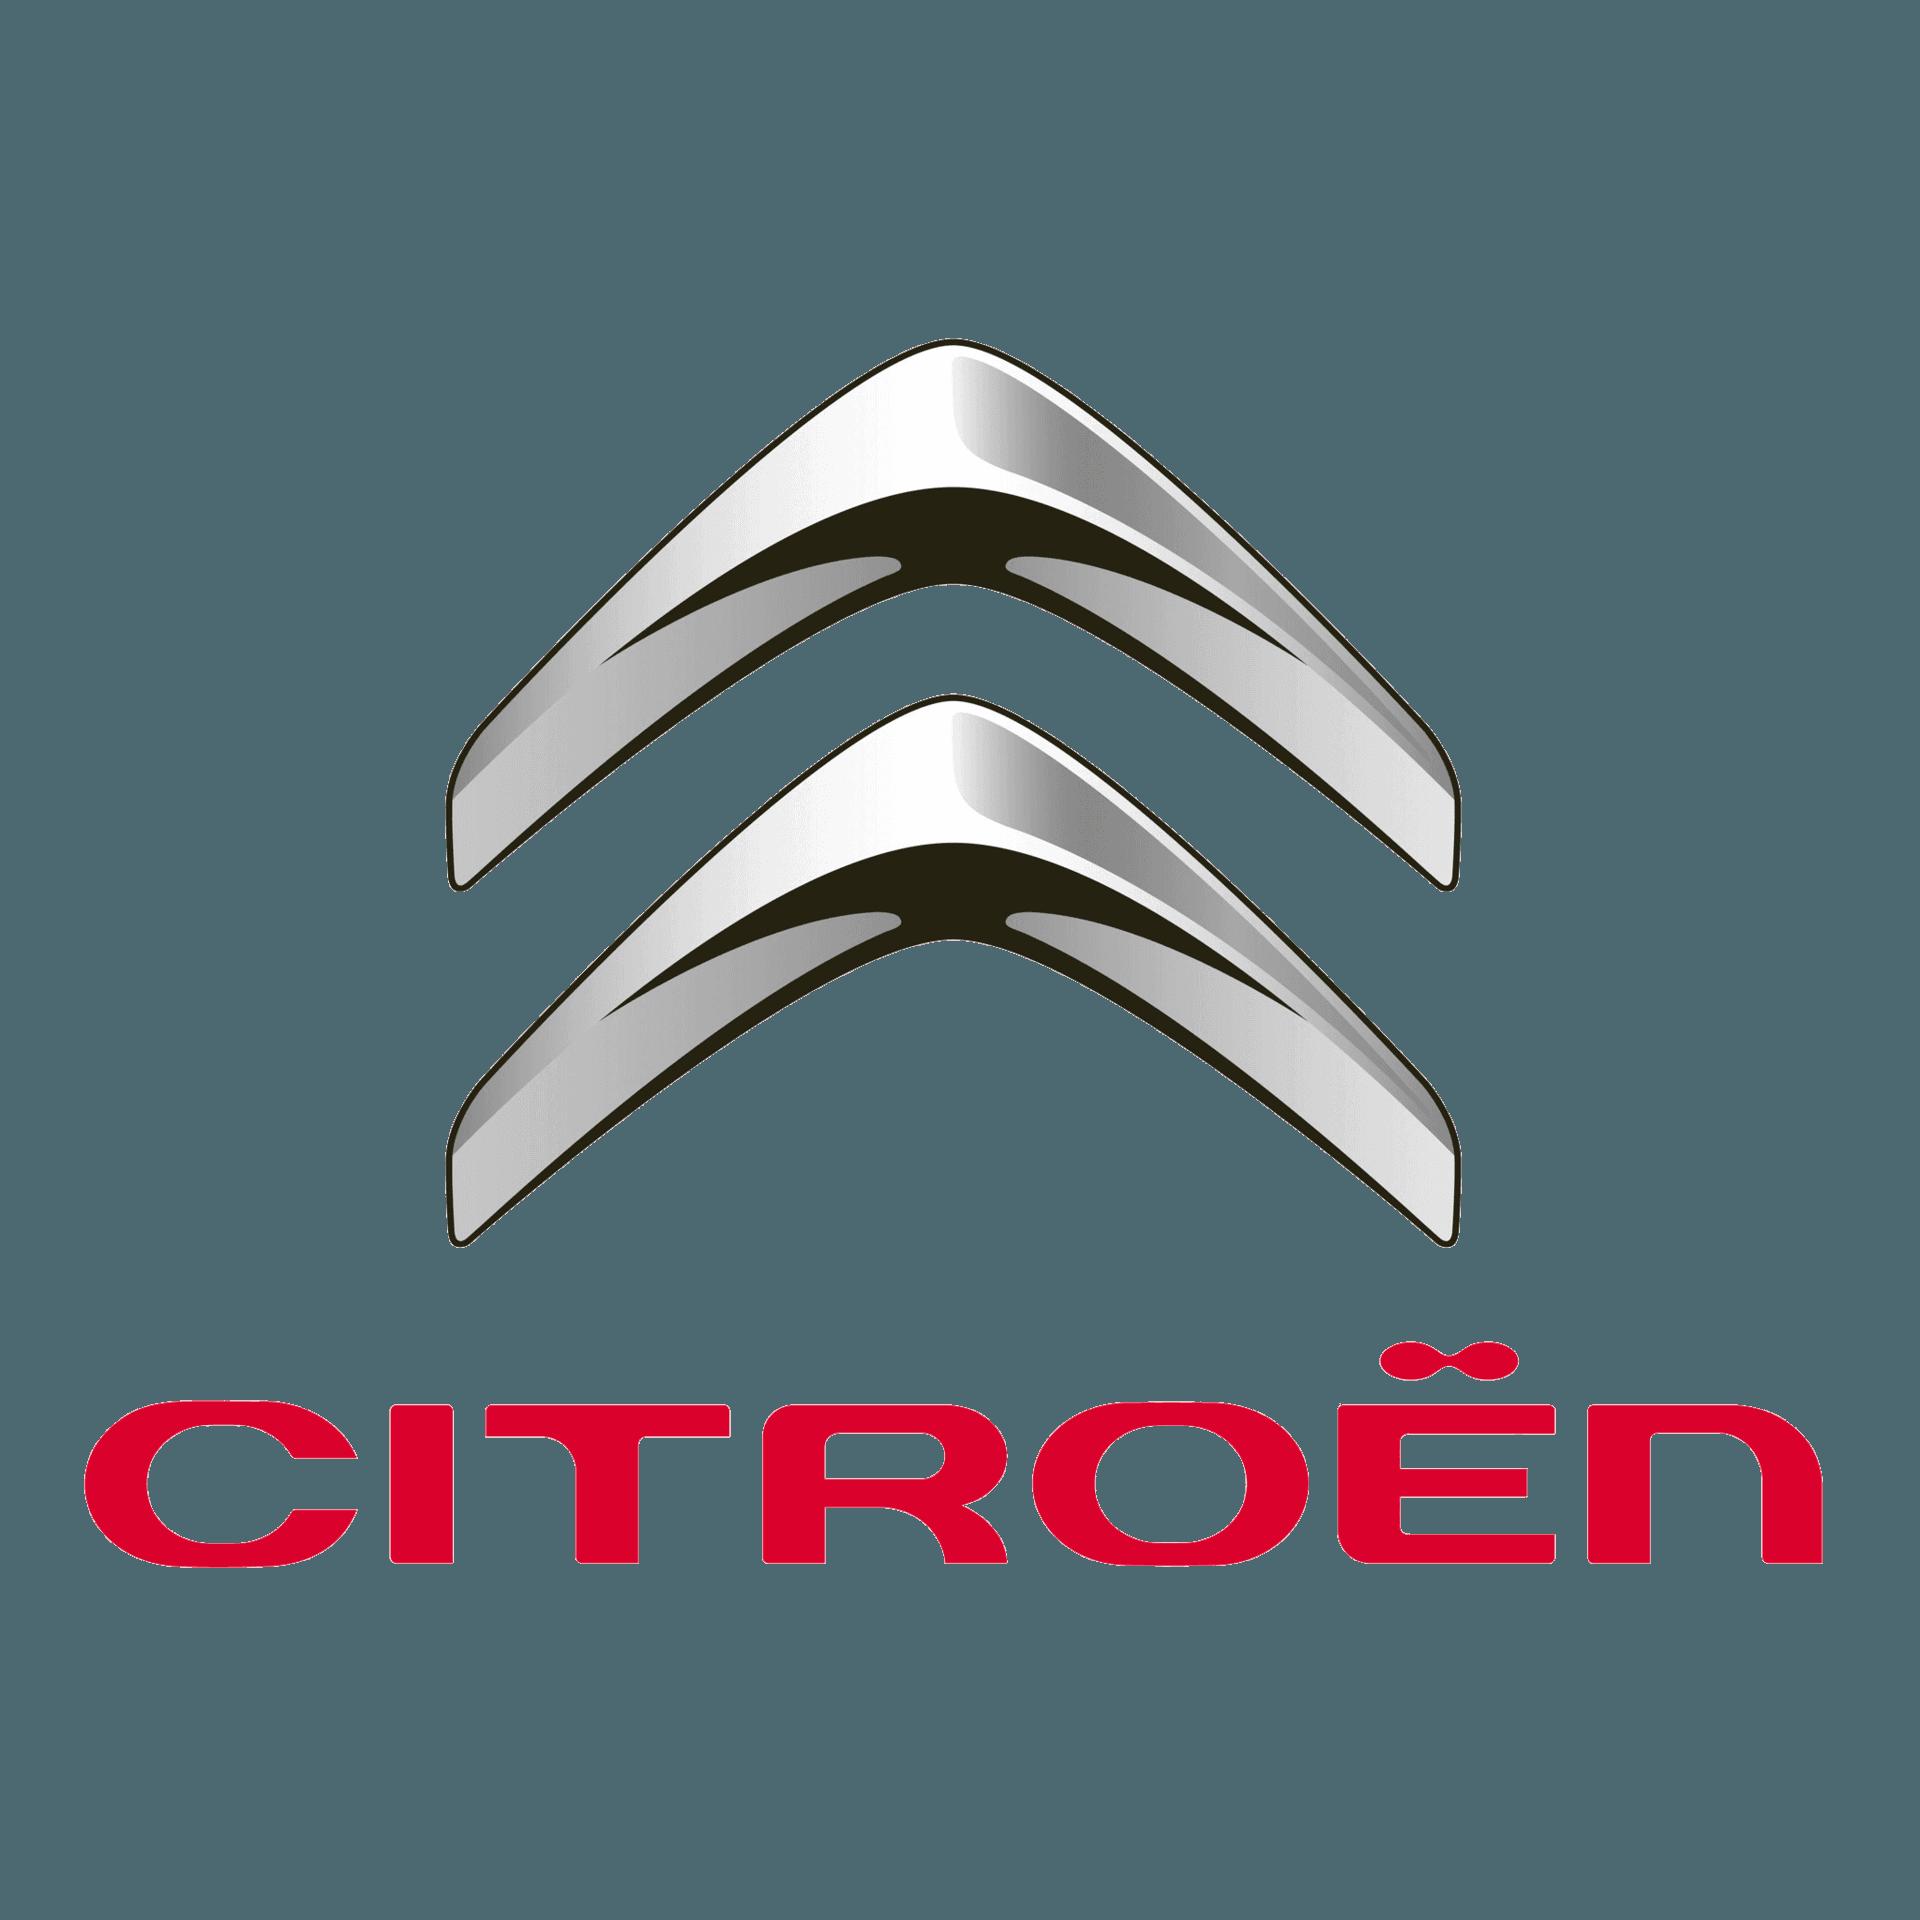 citroen - logo